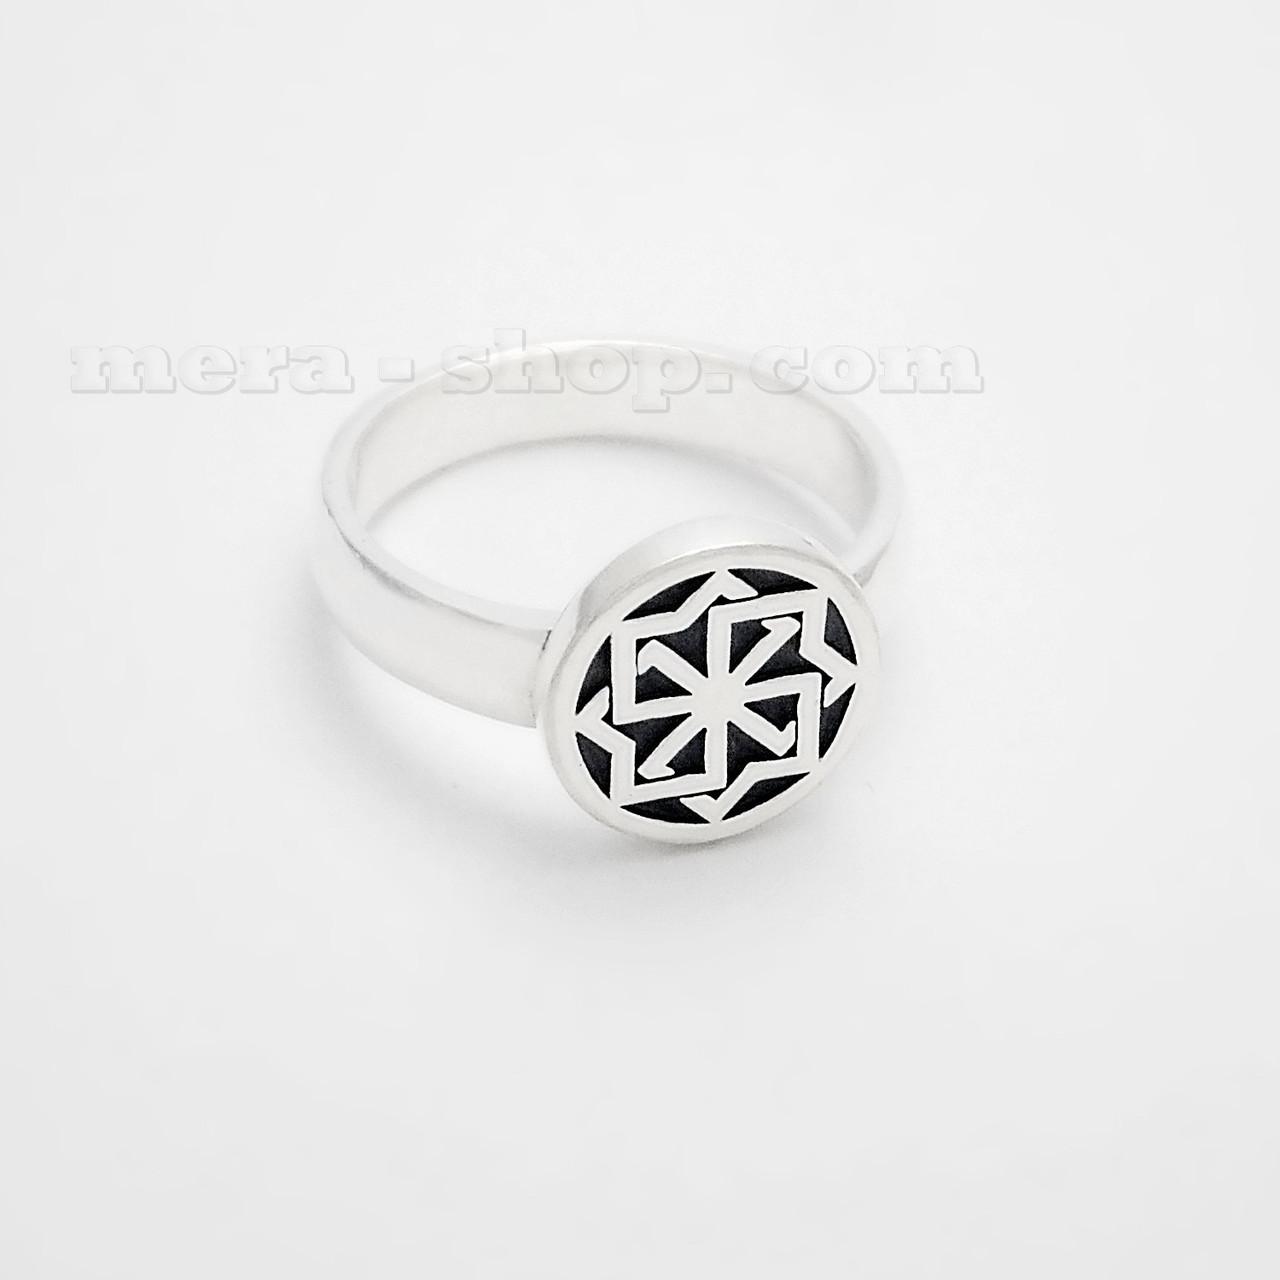 Молвинец кольцо оберег из серебра 925 пробы